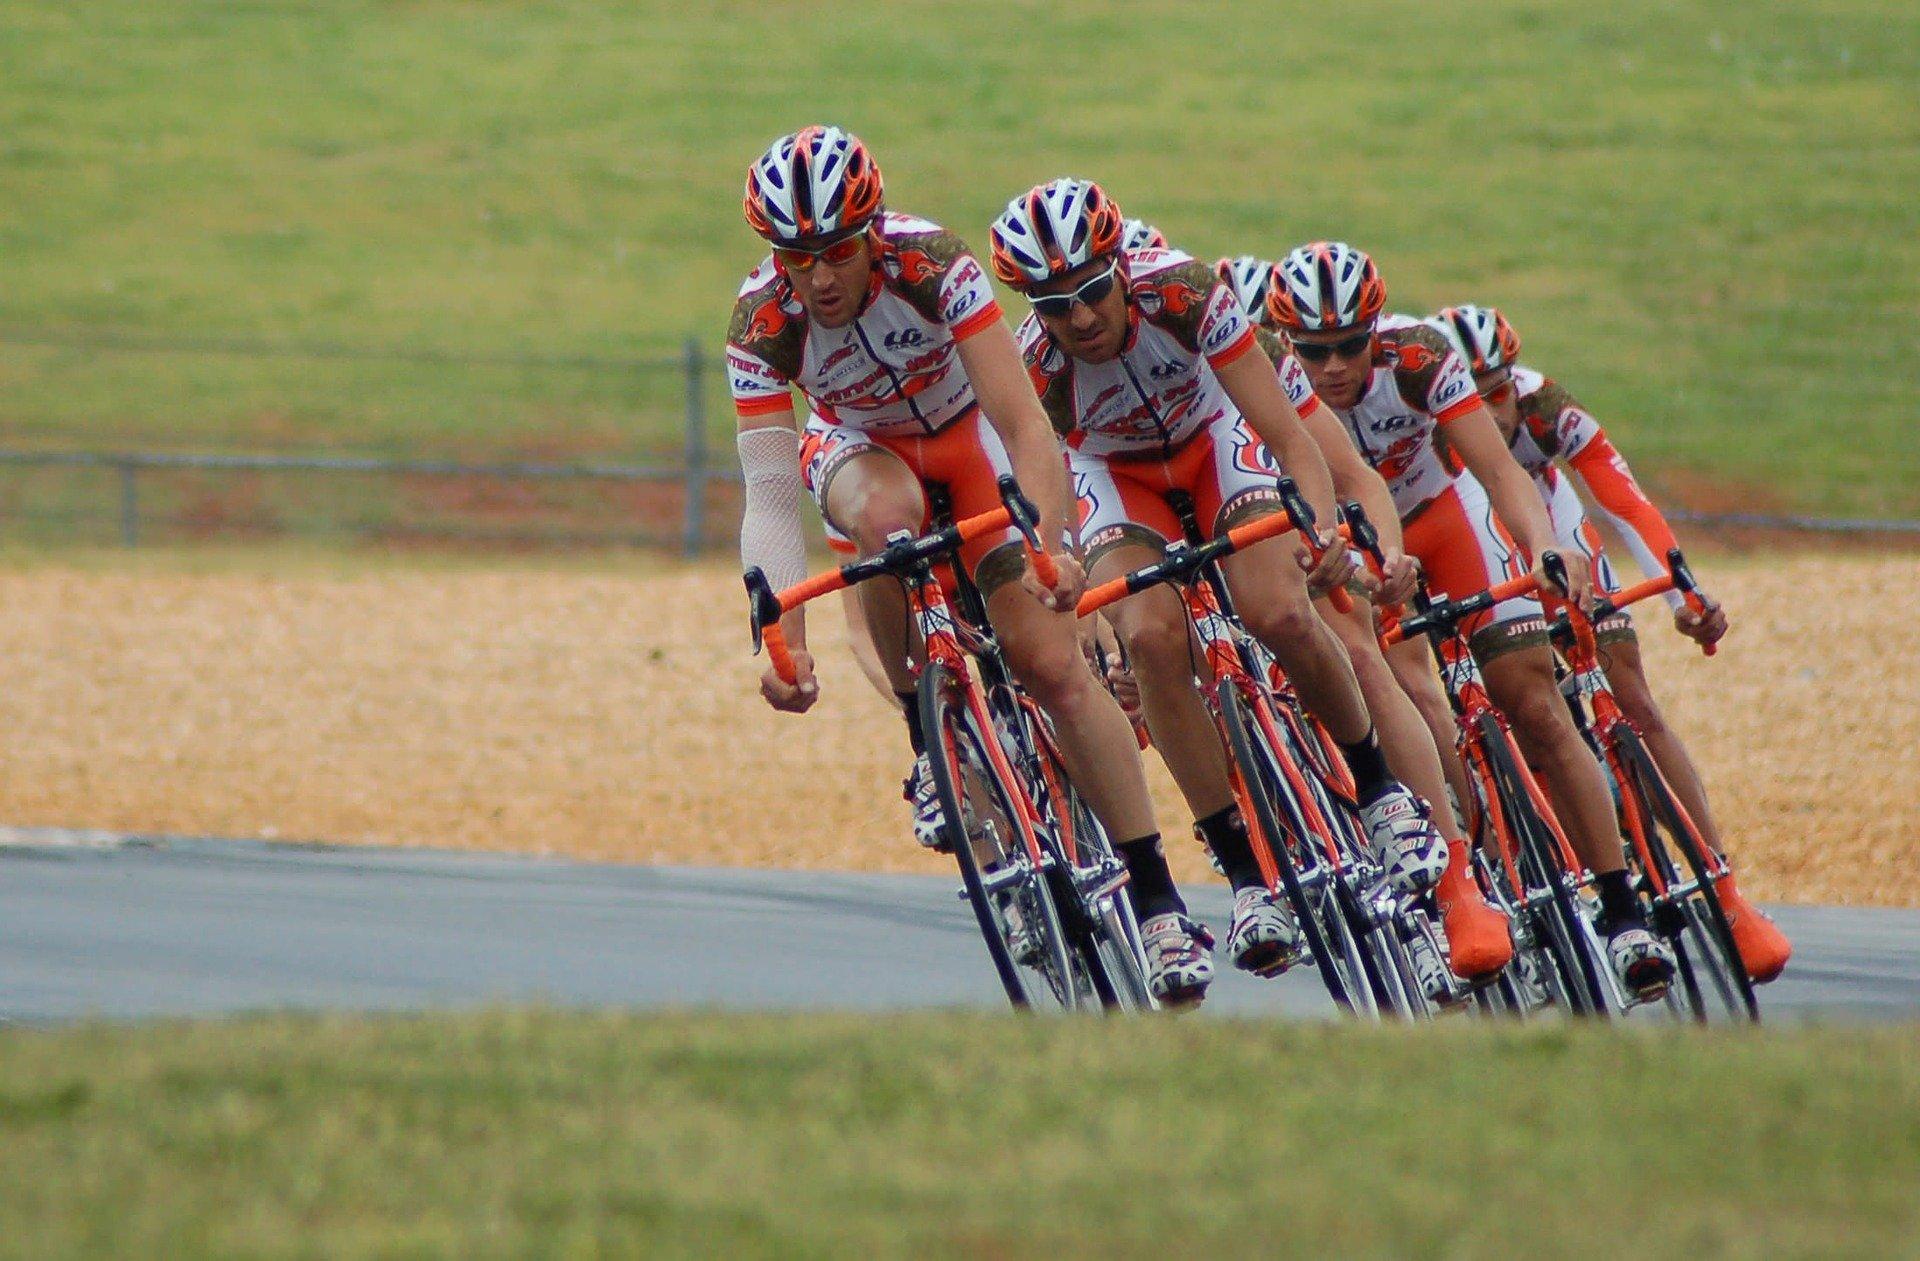 cyclists-1851269_1920